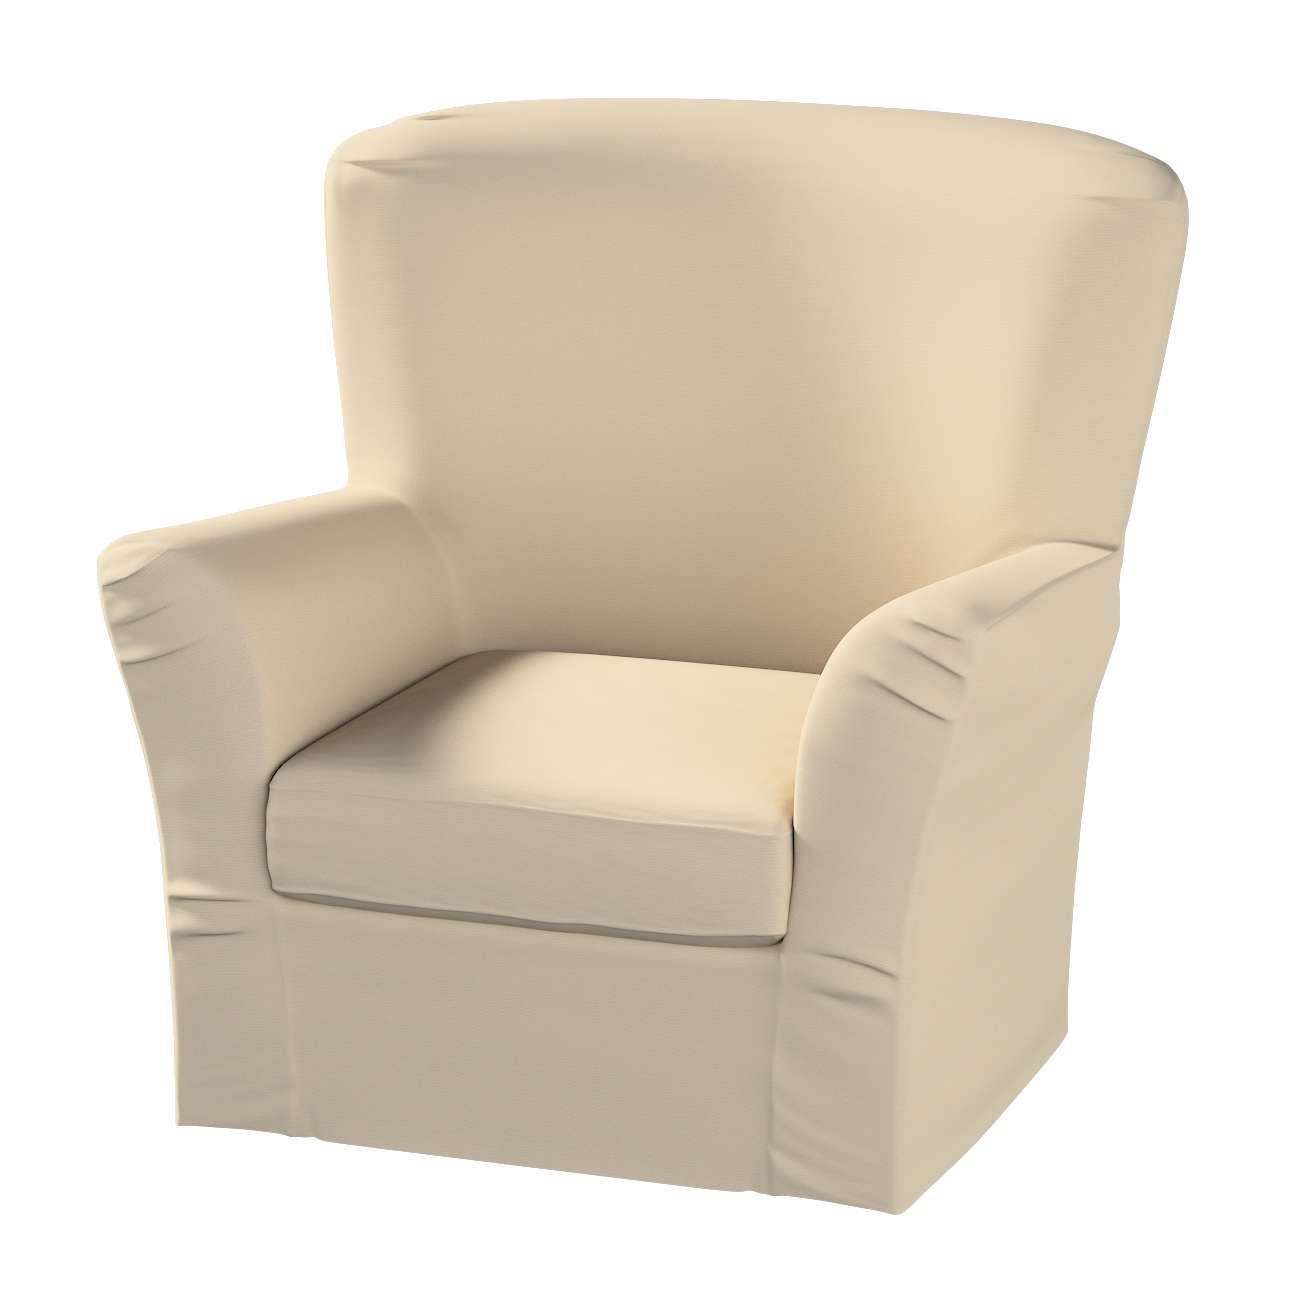 TOMELILLA fotelio užvalkalas TOMELILLA fotelis kolekcijoje Cotton Panama, audinys: 702-01